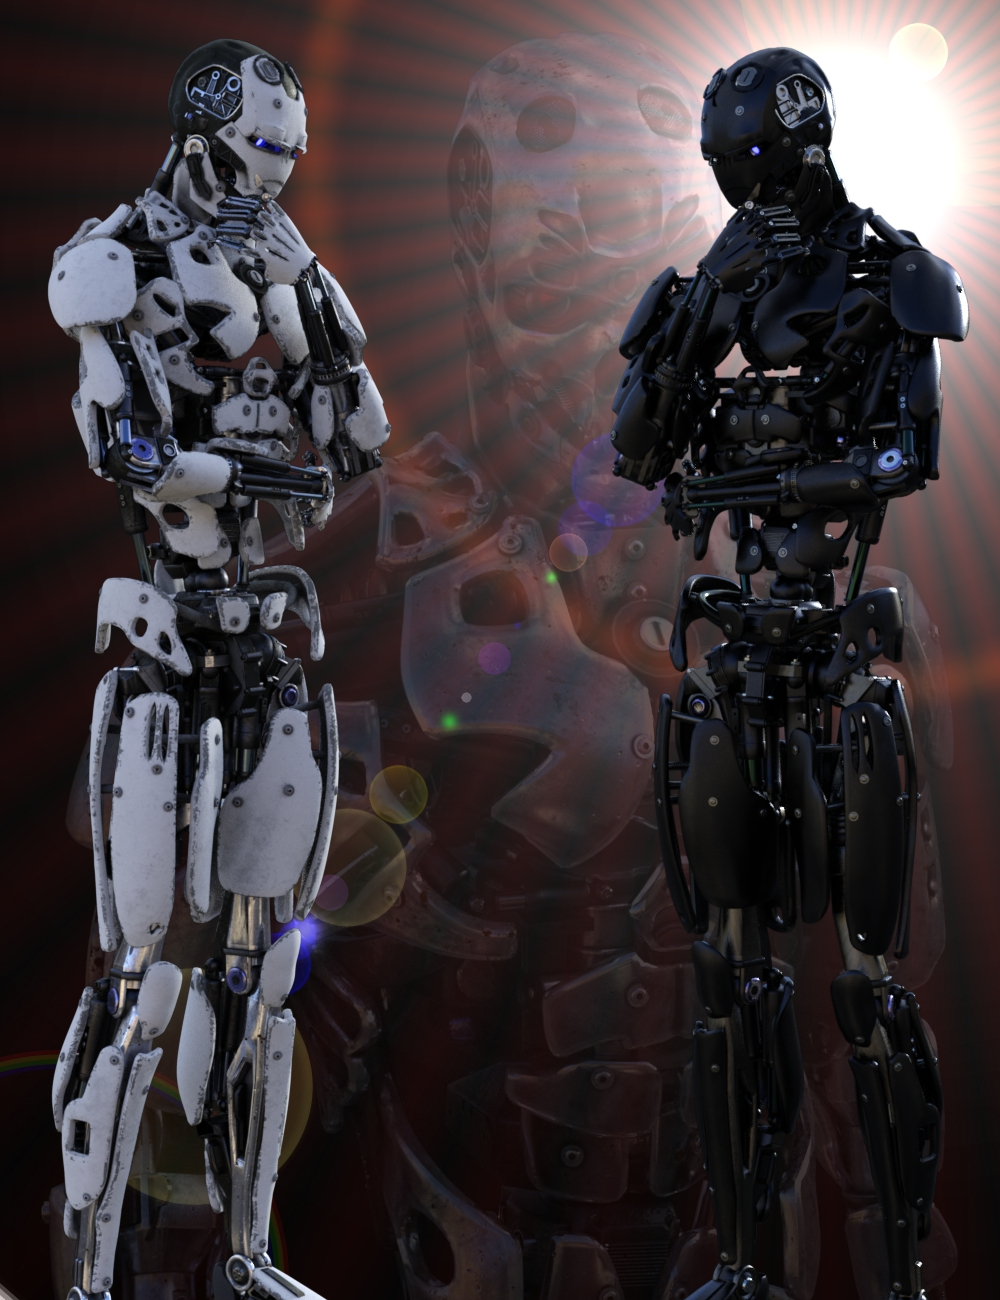 Cyborg Generation 8 by: DzFire, 3D Models by Daz 3D